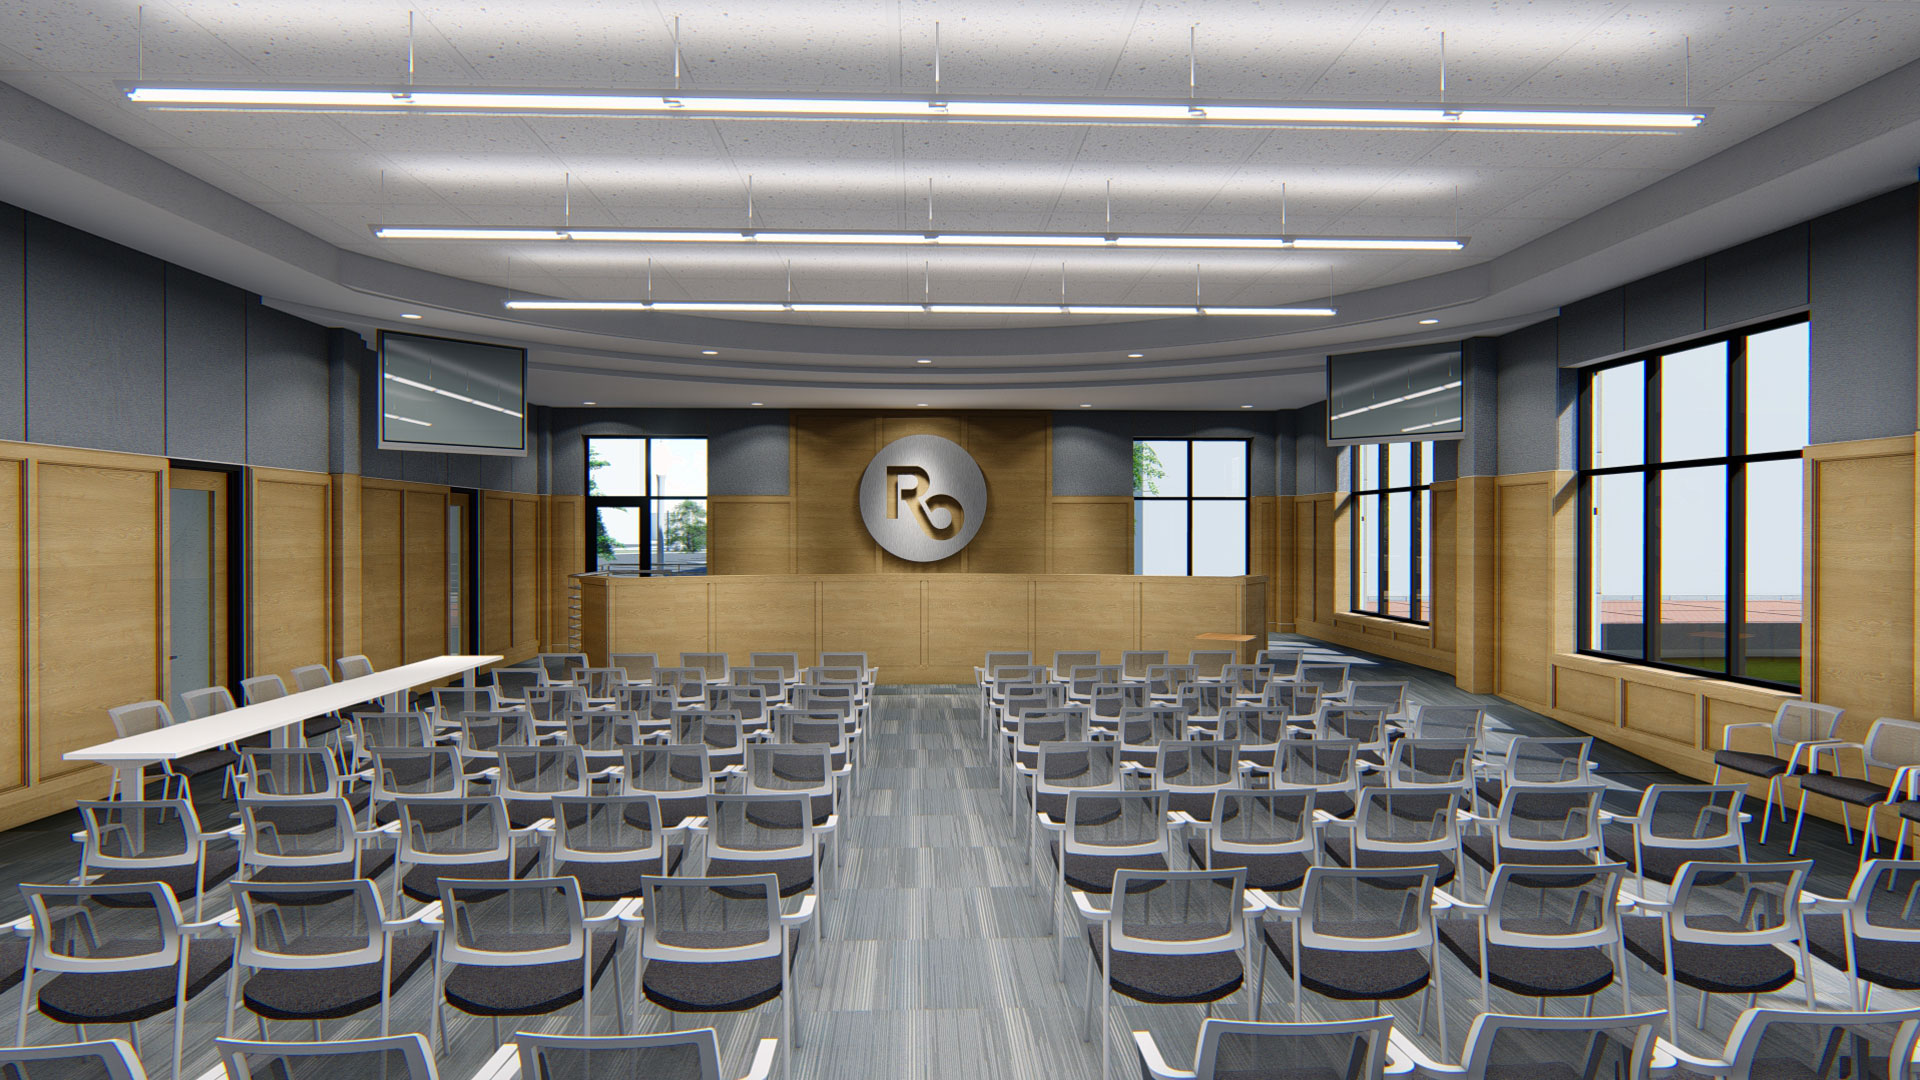 Royal Oak City Hall conference room interior rendering